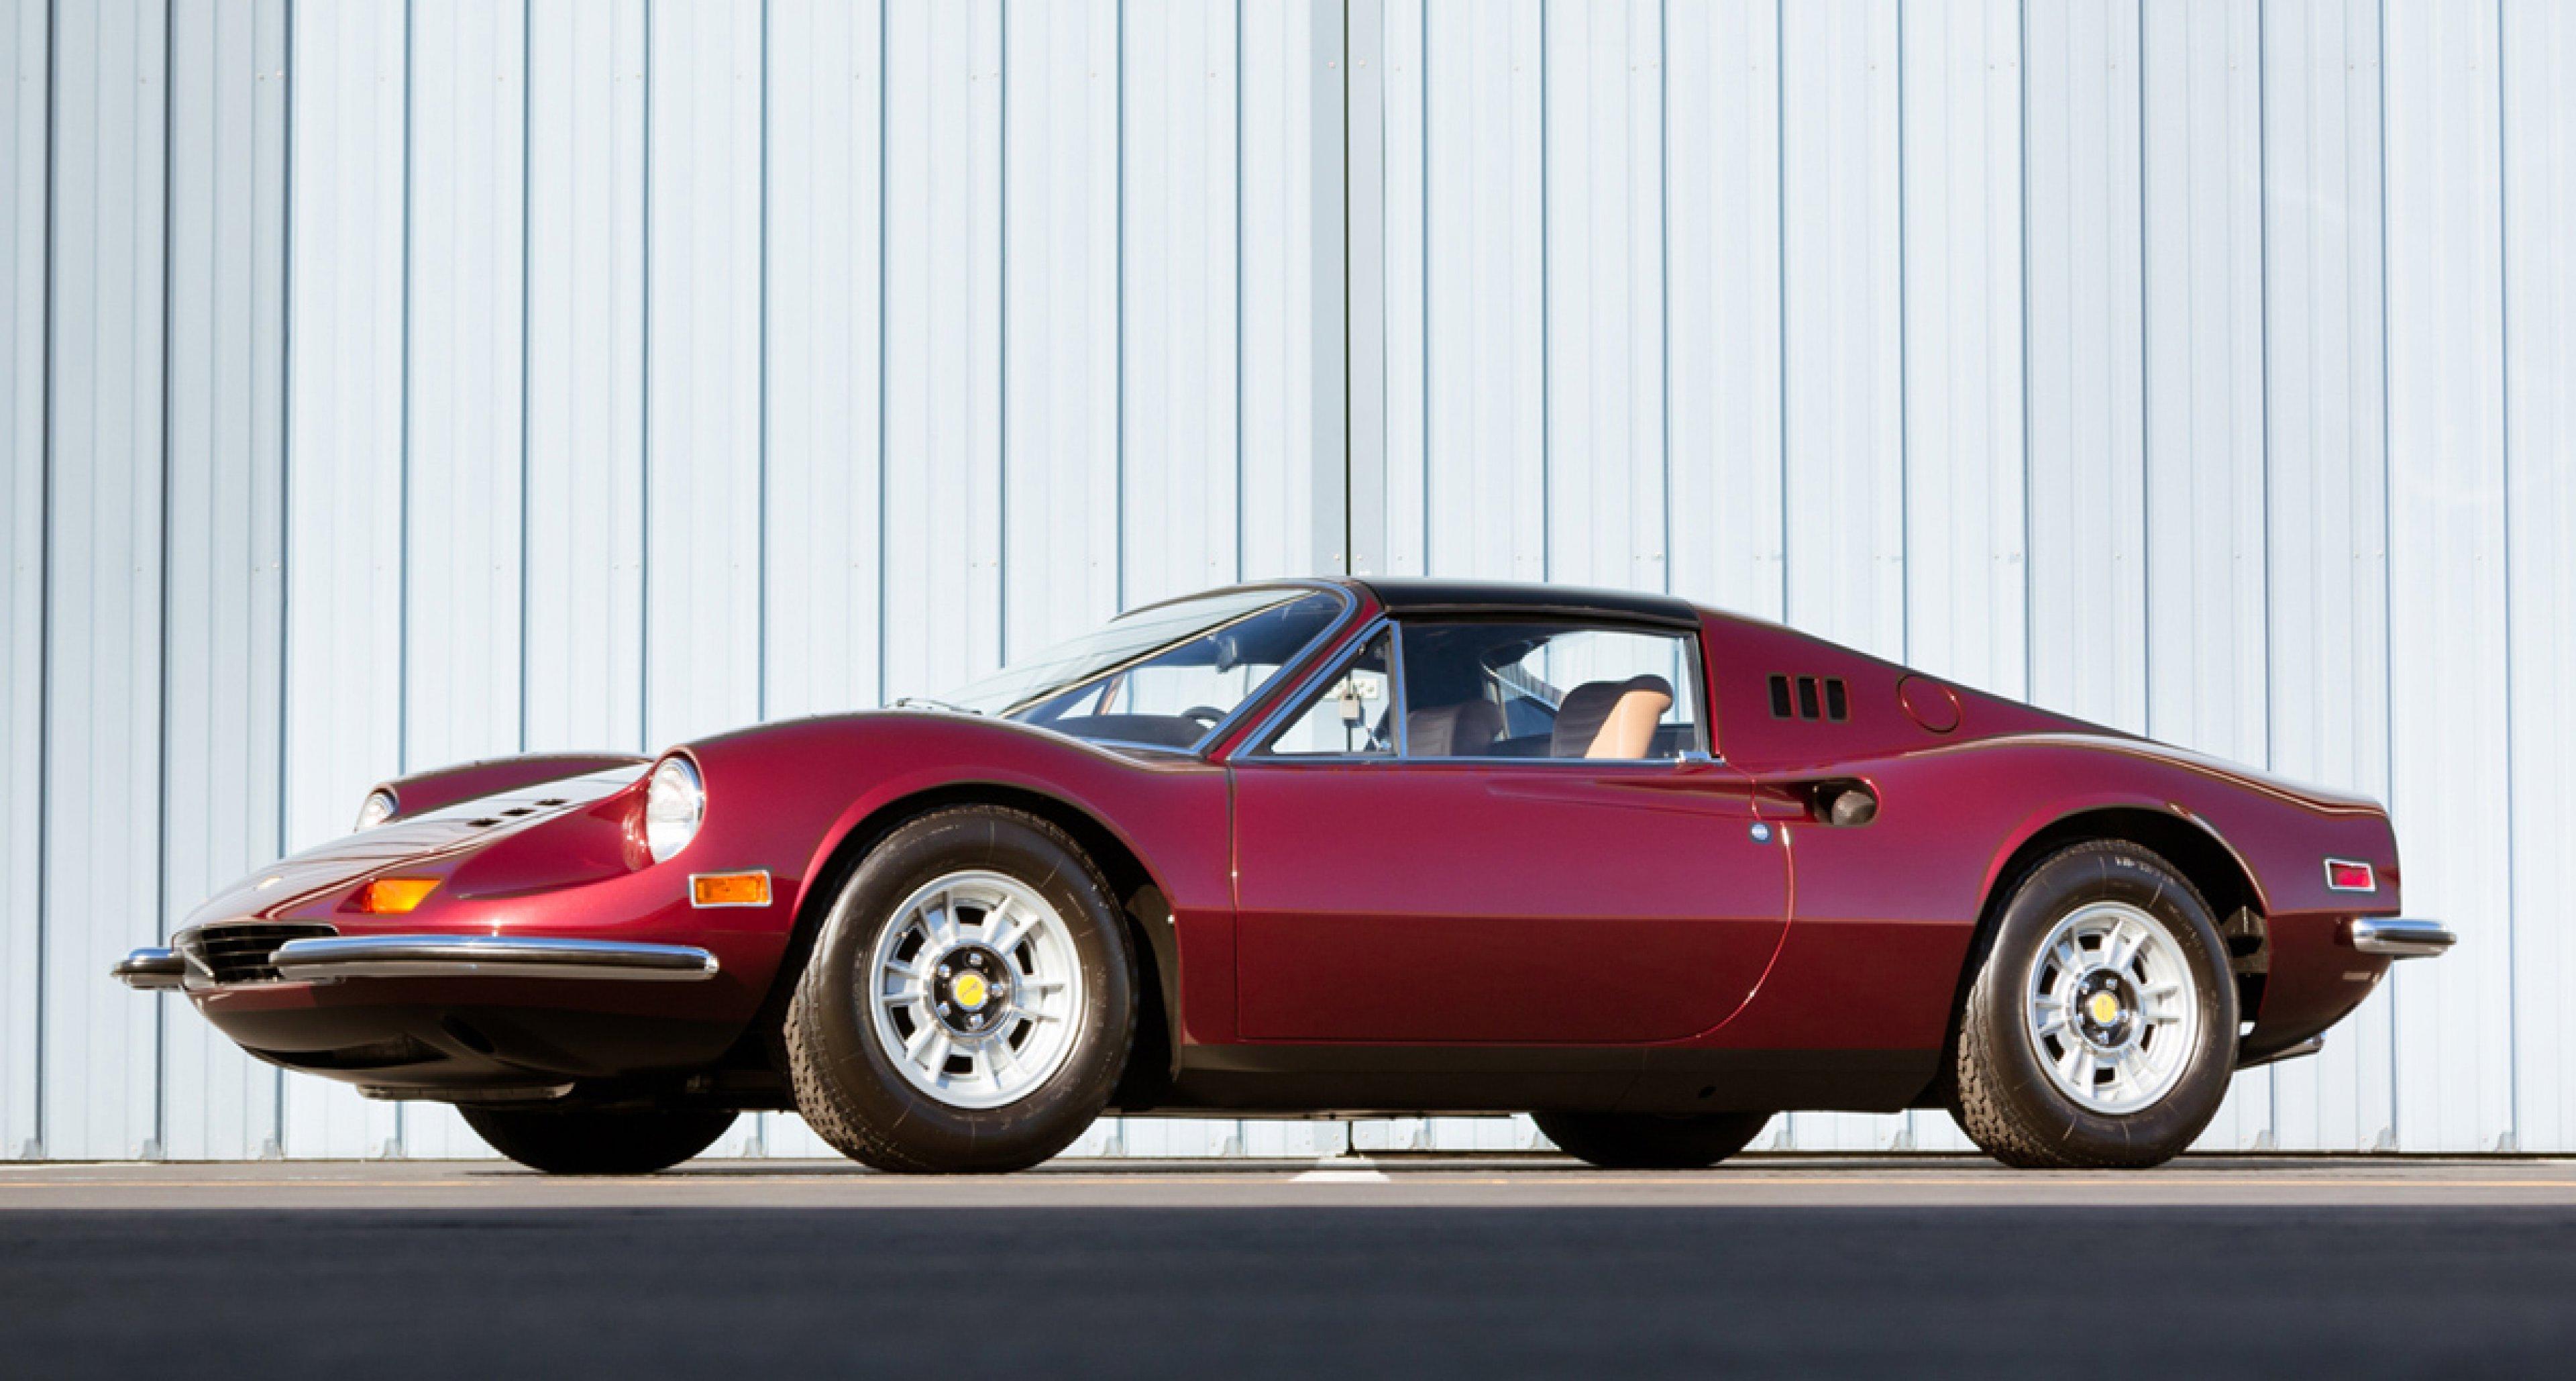 Gooding and Co: 1973 Ferrari 246 GTS Dino (Lot 109)